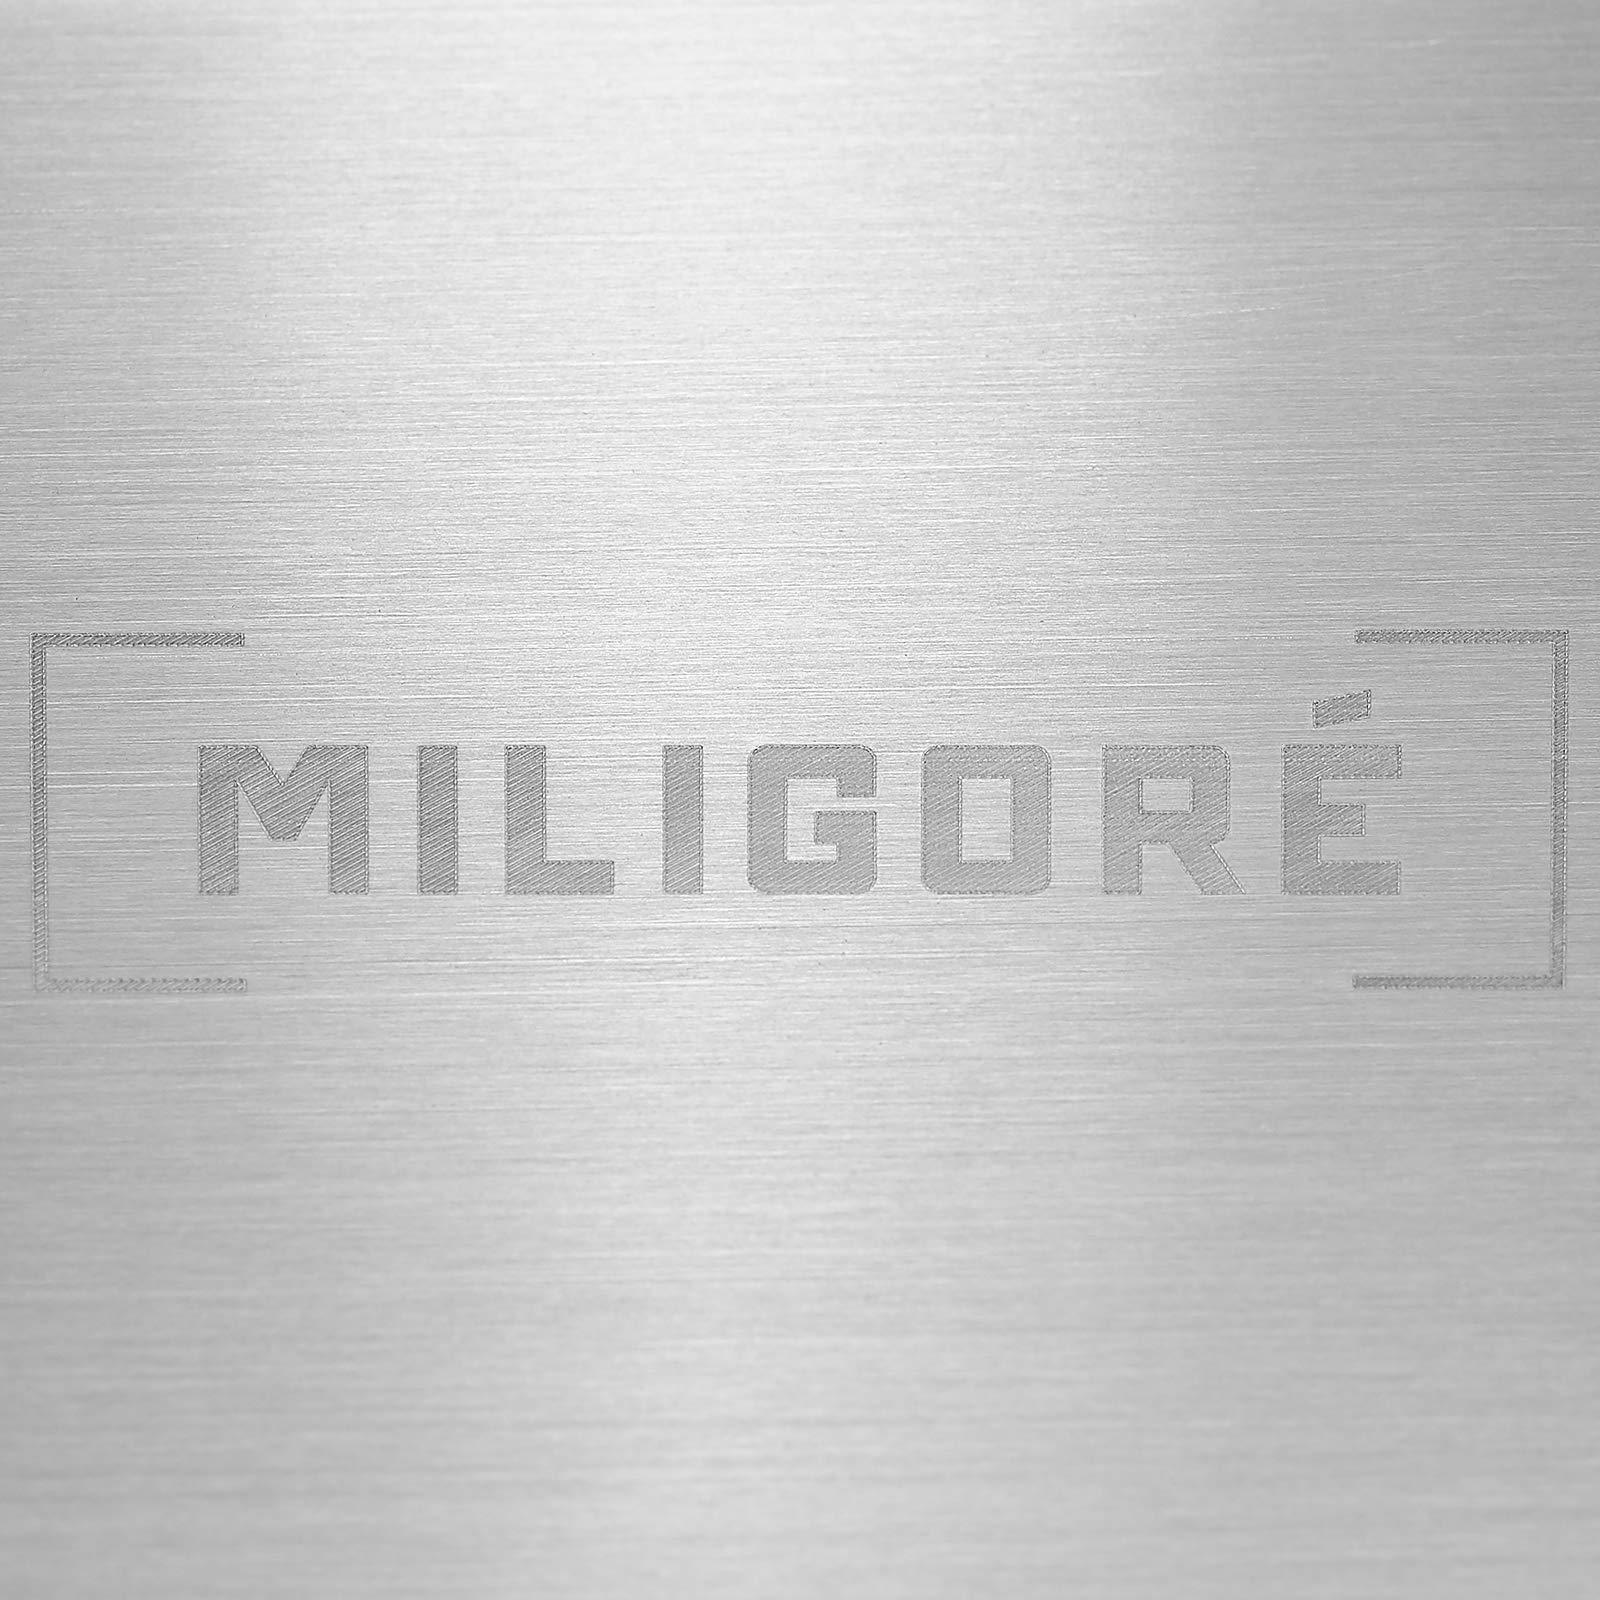 Miligore 30'' x 18'' x 9'' Deep Single Bowl Undermount Zero Radius Stainless Steel Kitchen Sink - Includes Drain/Adjustable Dish Rack by Miligore (Image #4)